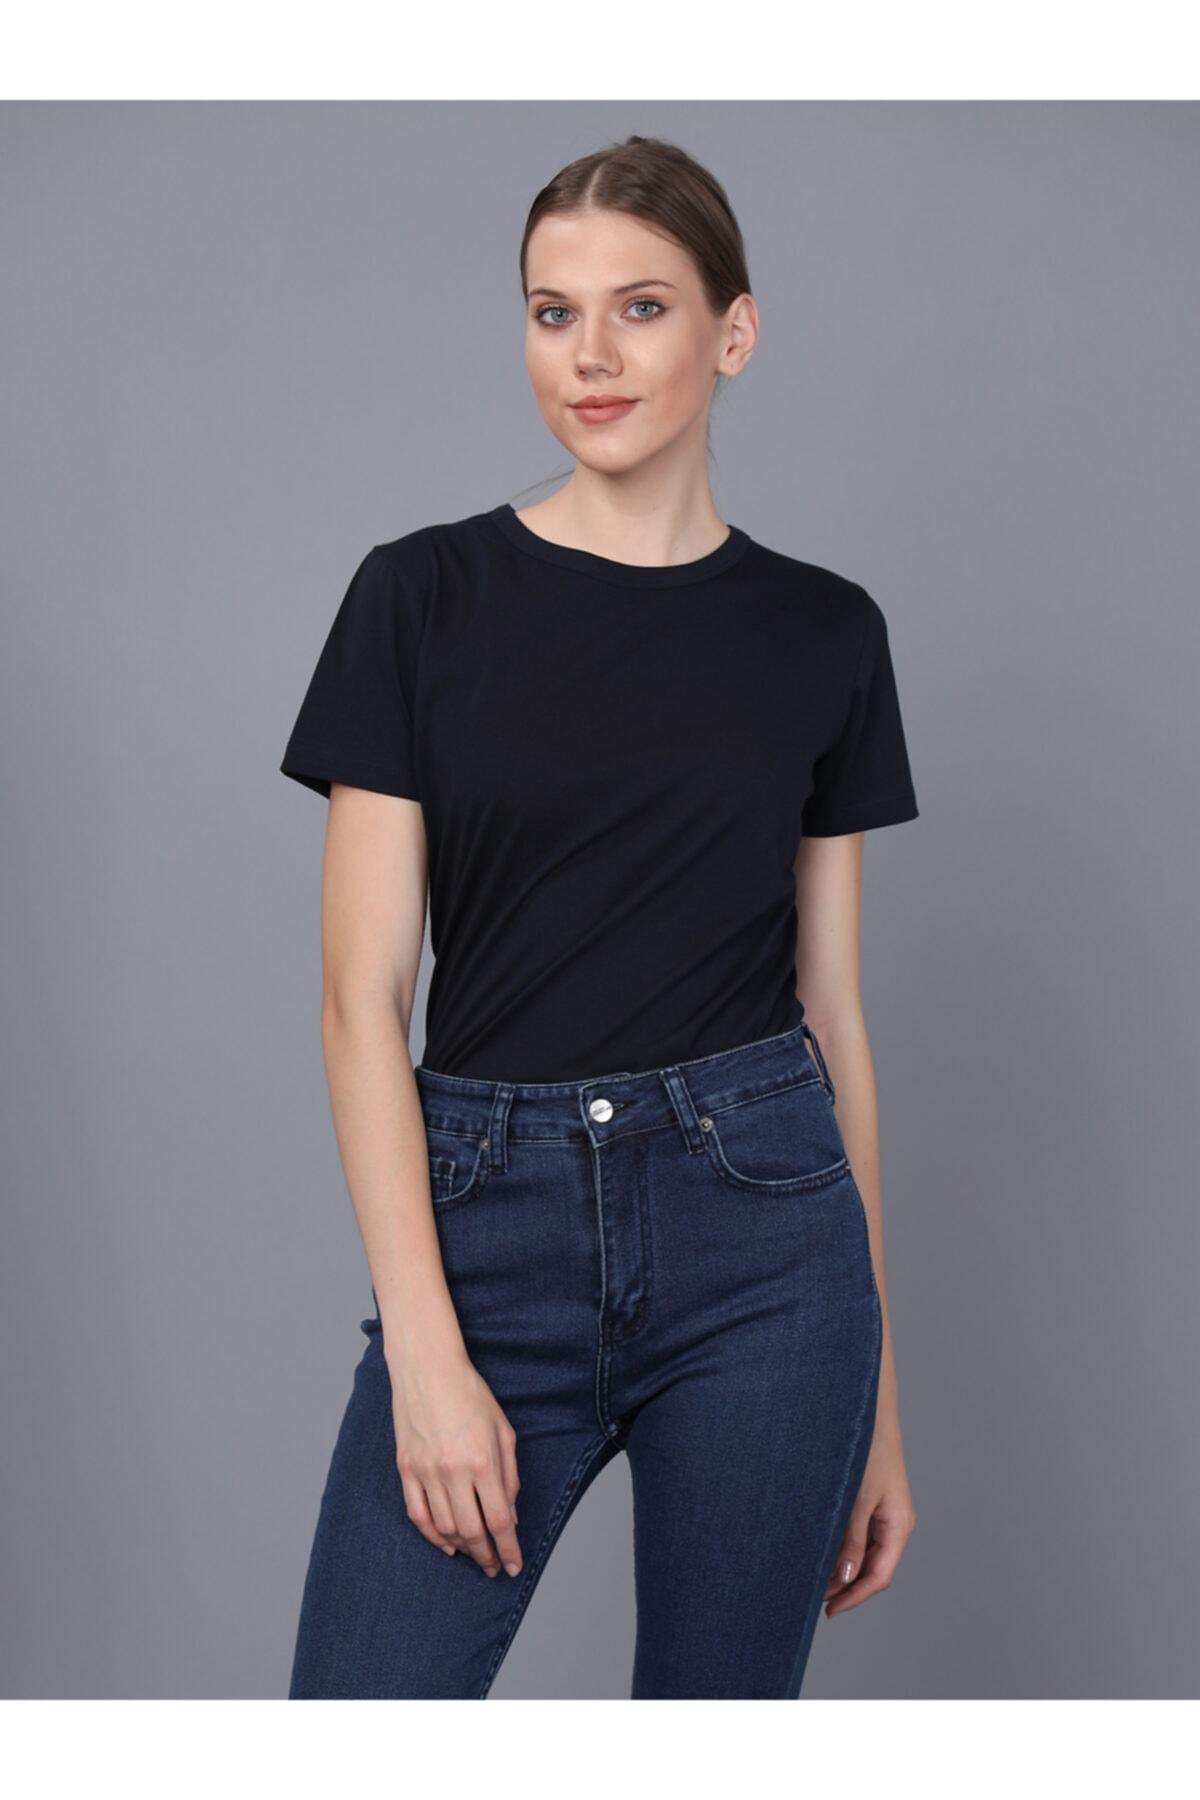 Basics&More Kadın Lacivert Bisiklet Yaka T-shirt 1